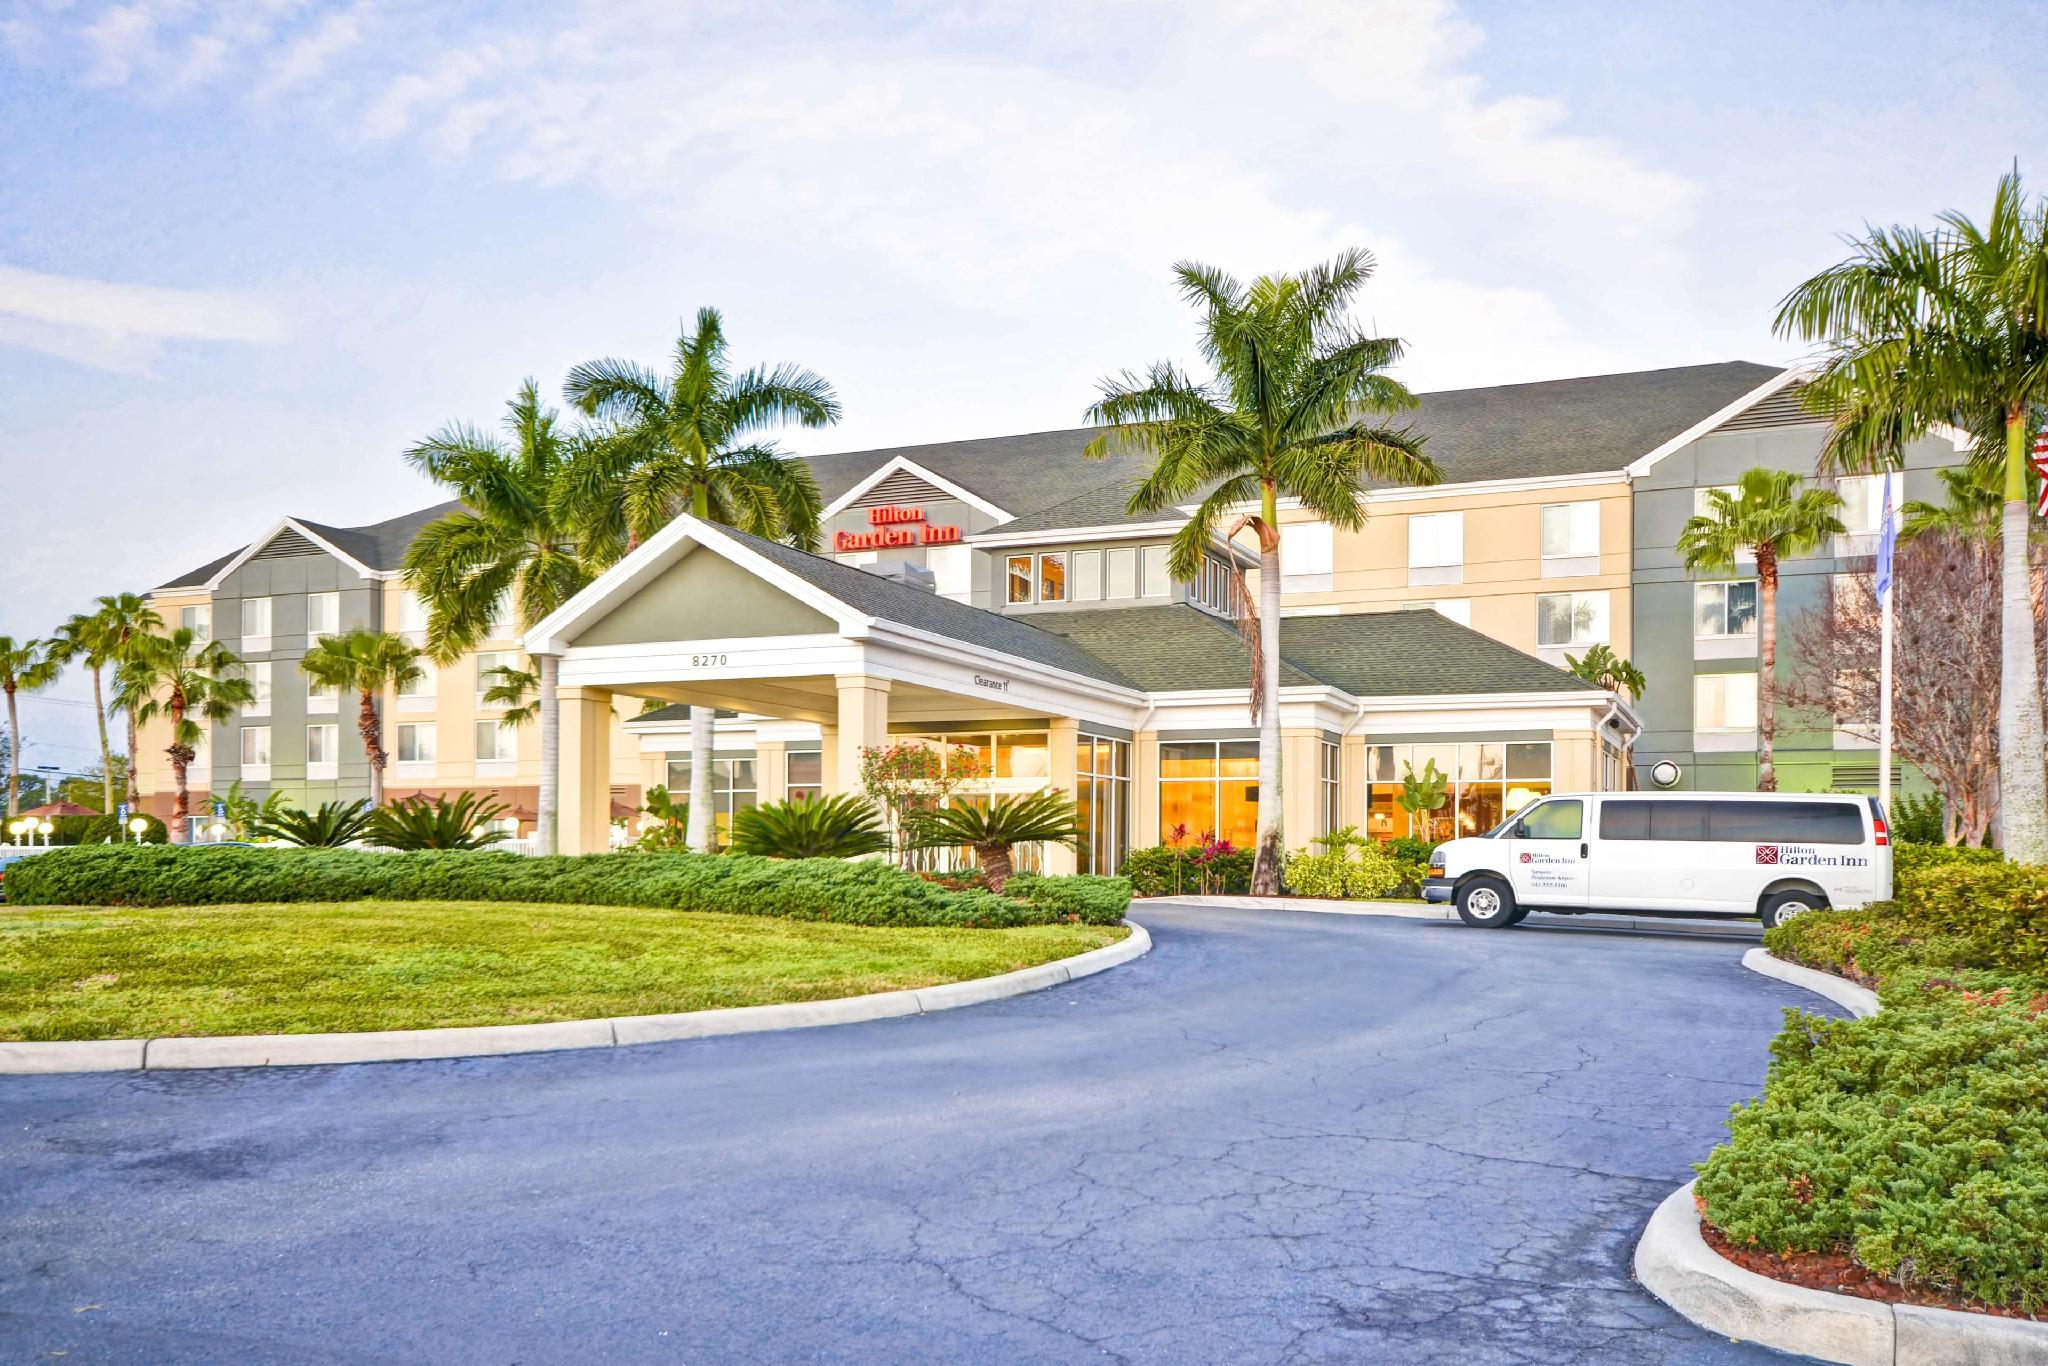 Hilton Garden Inn Sarasota Bradenton Airport Hotel